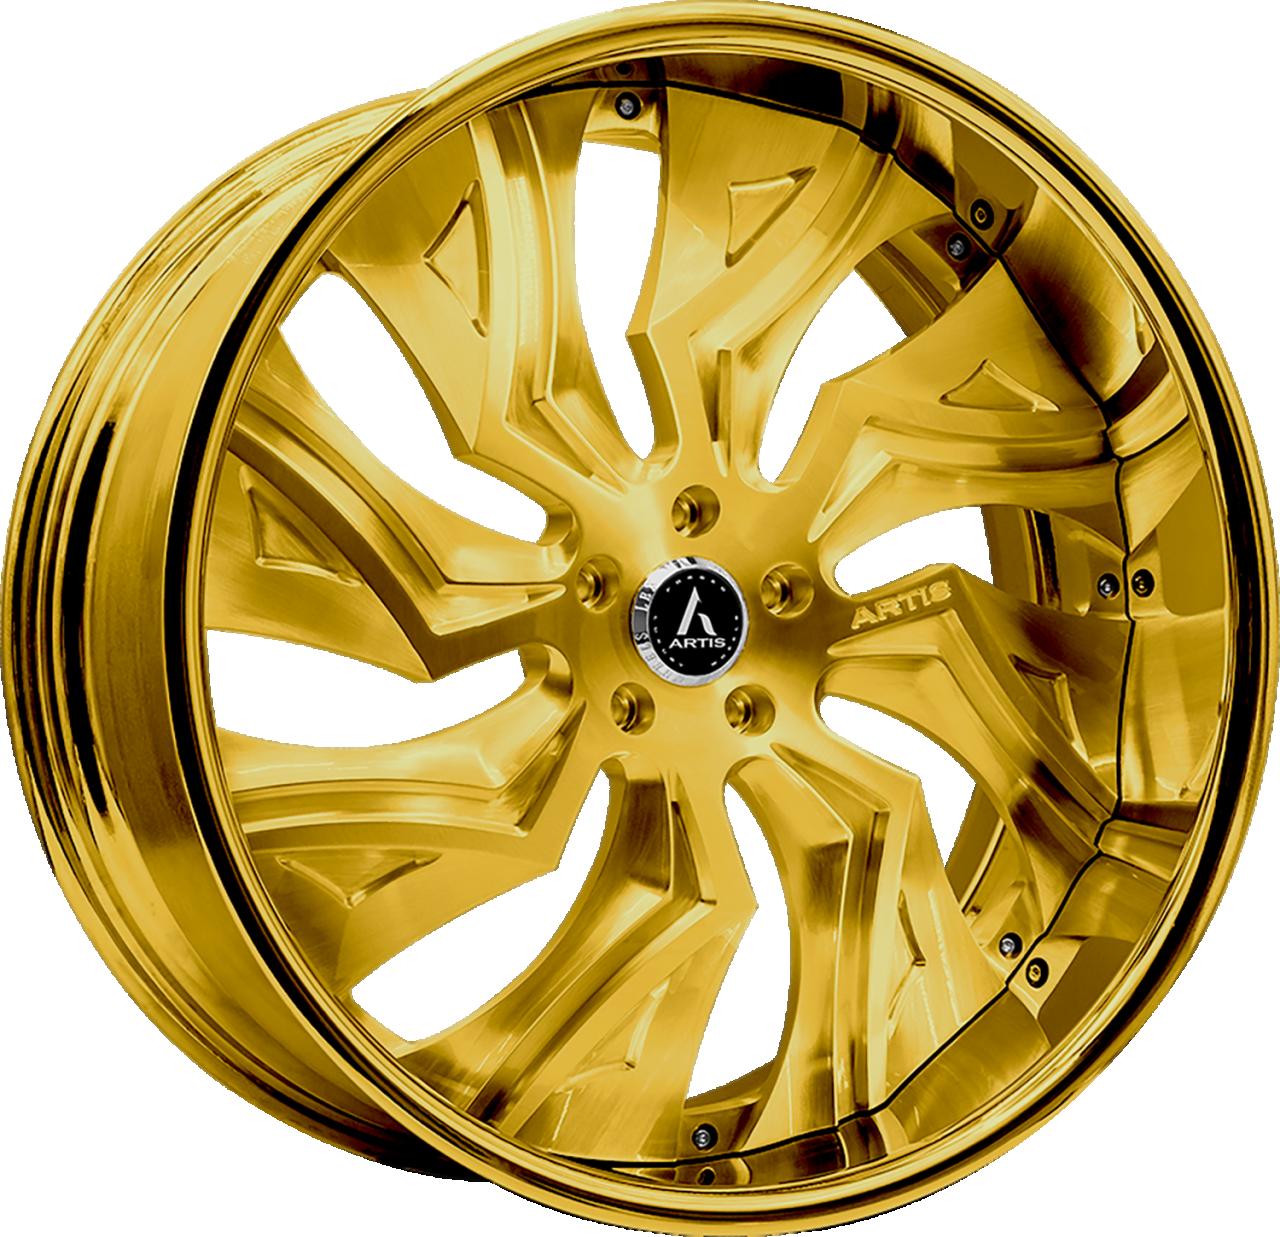 Artis Forged Buckeye wheel with Custom Gold finish